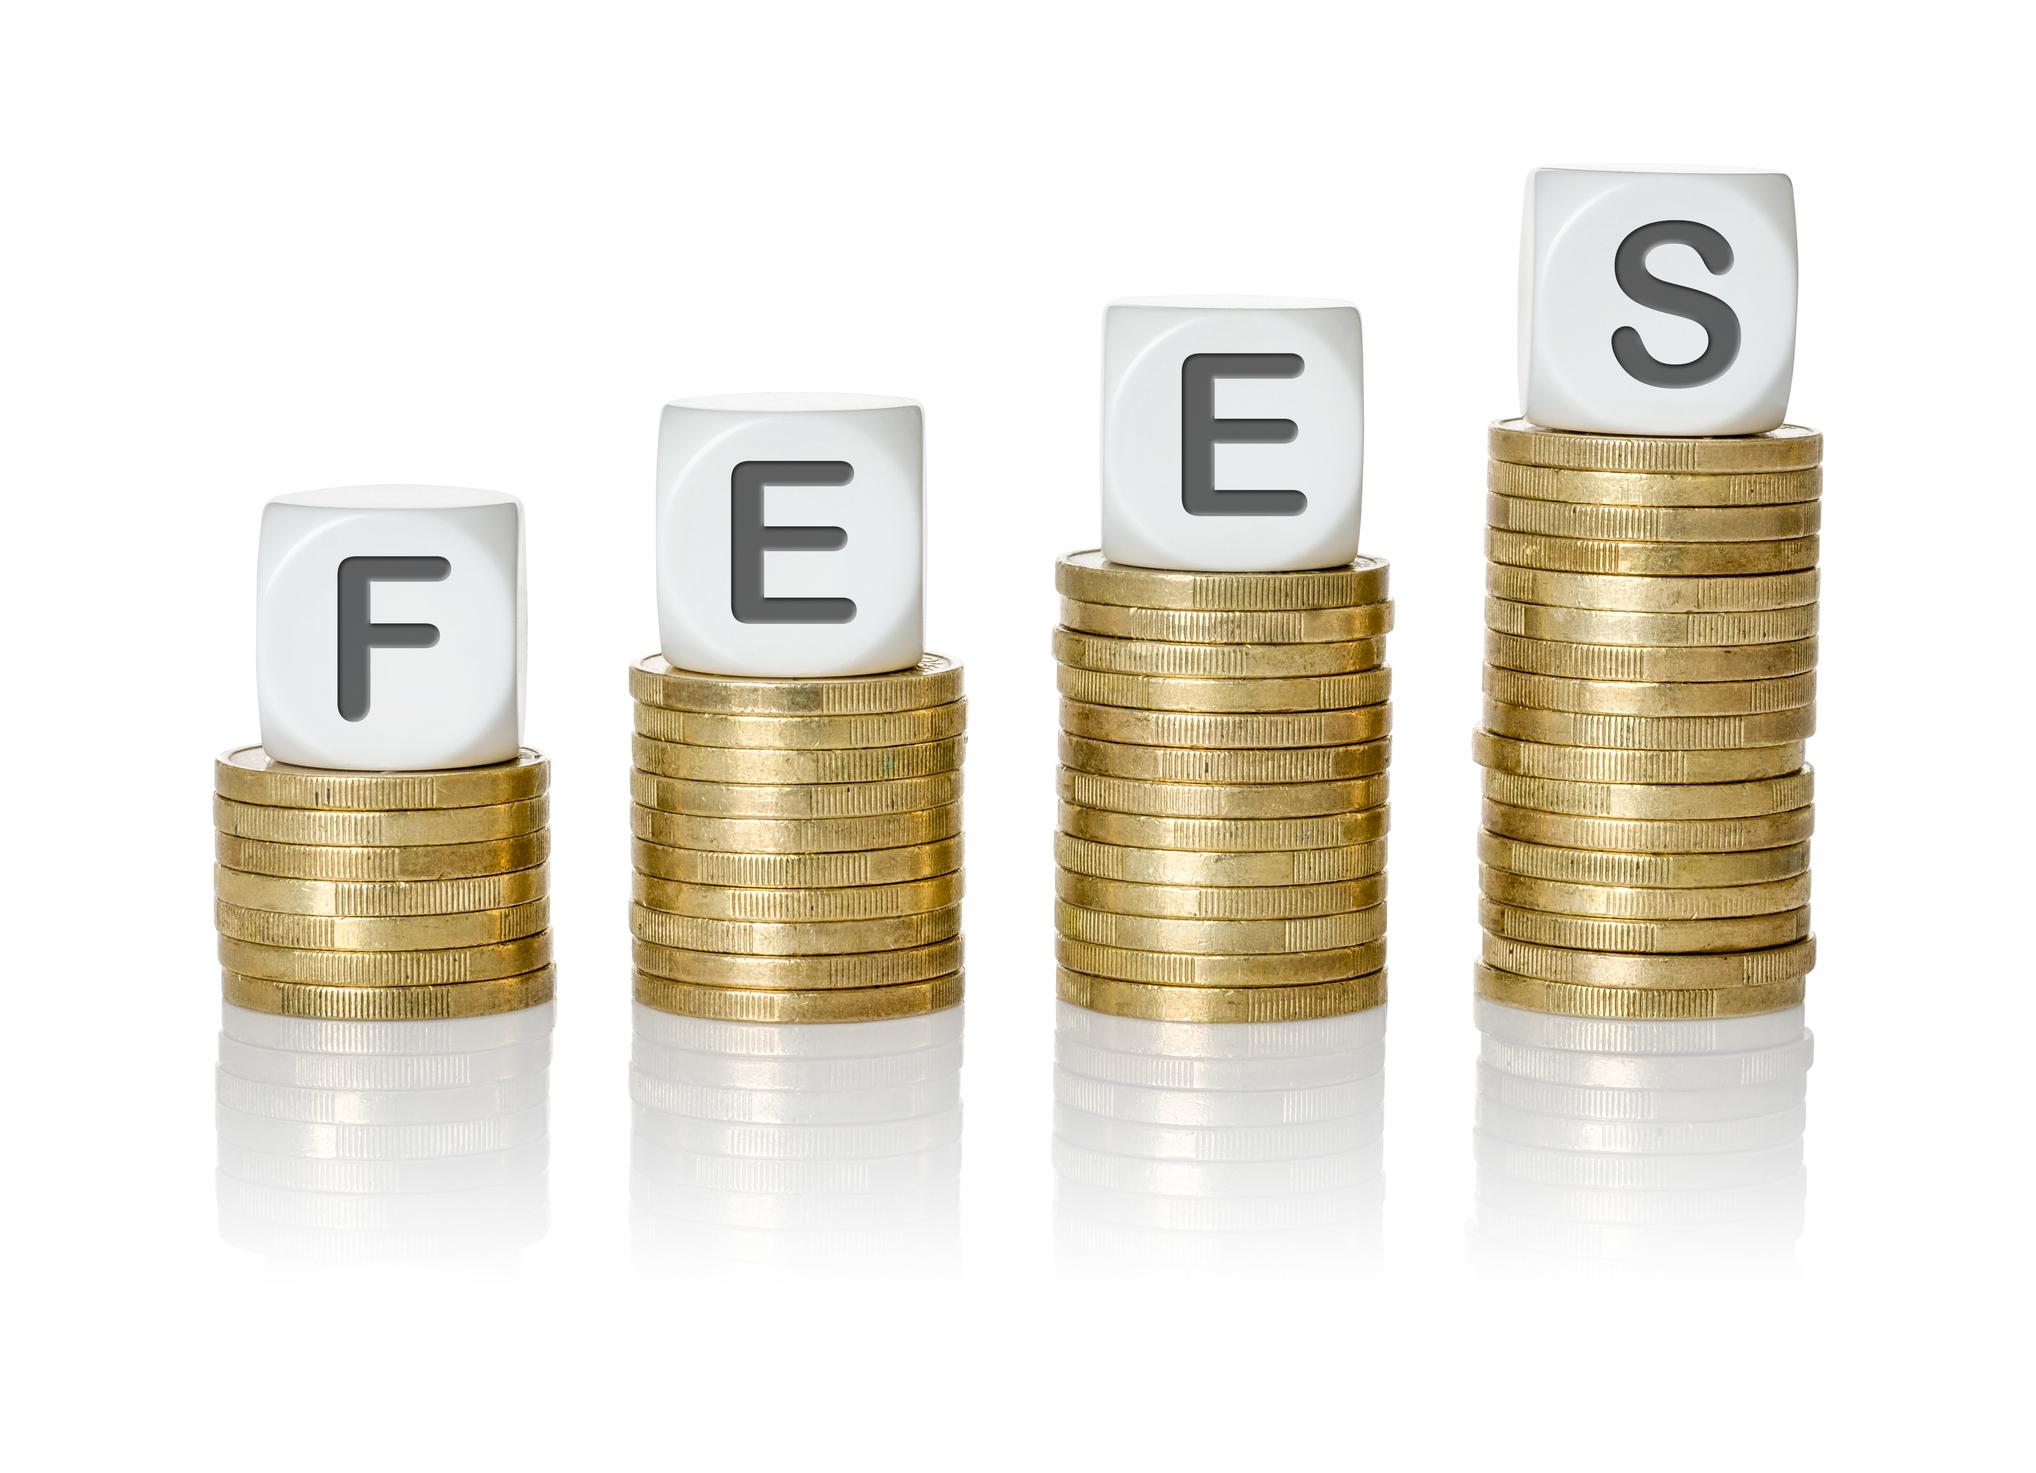 IRCC fee increase